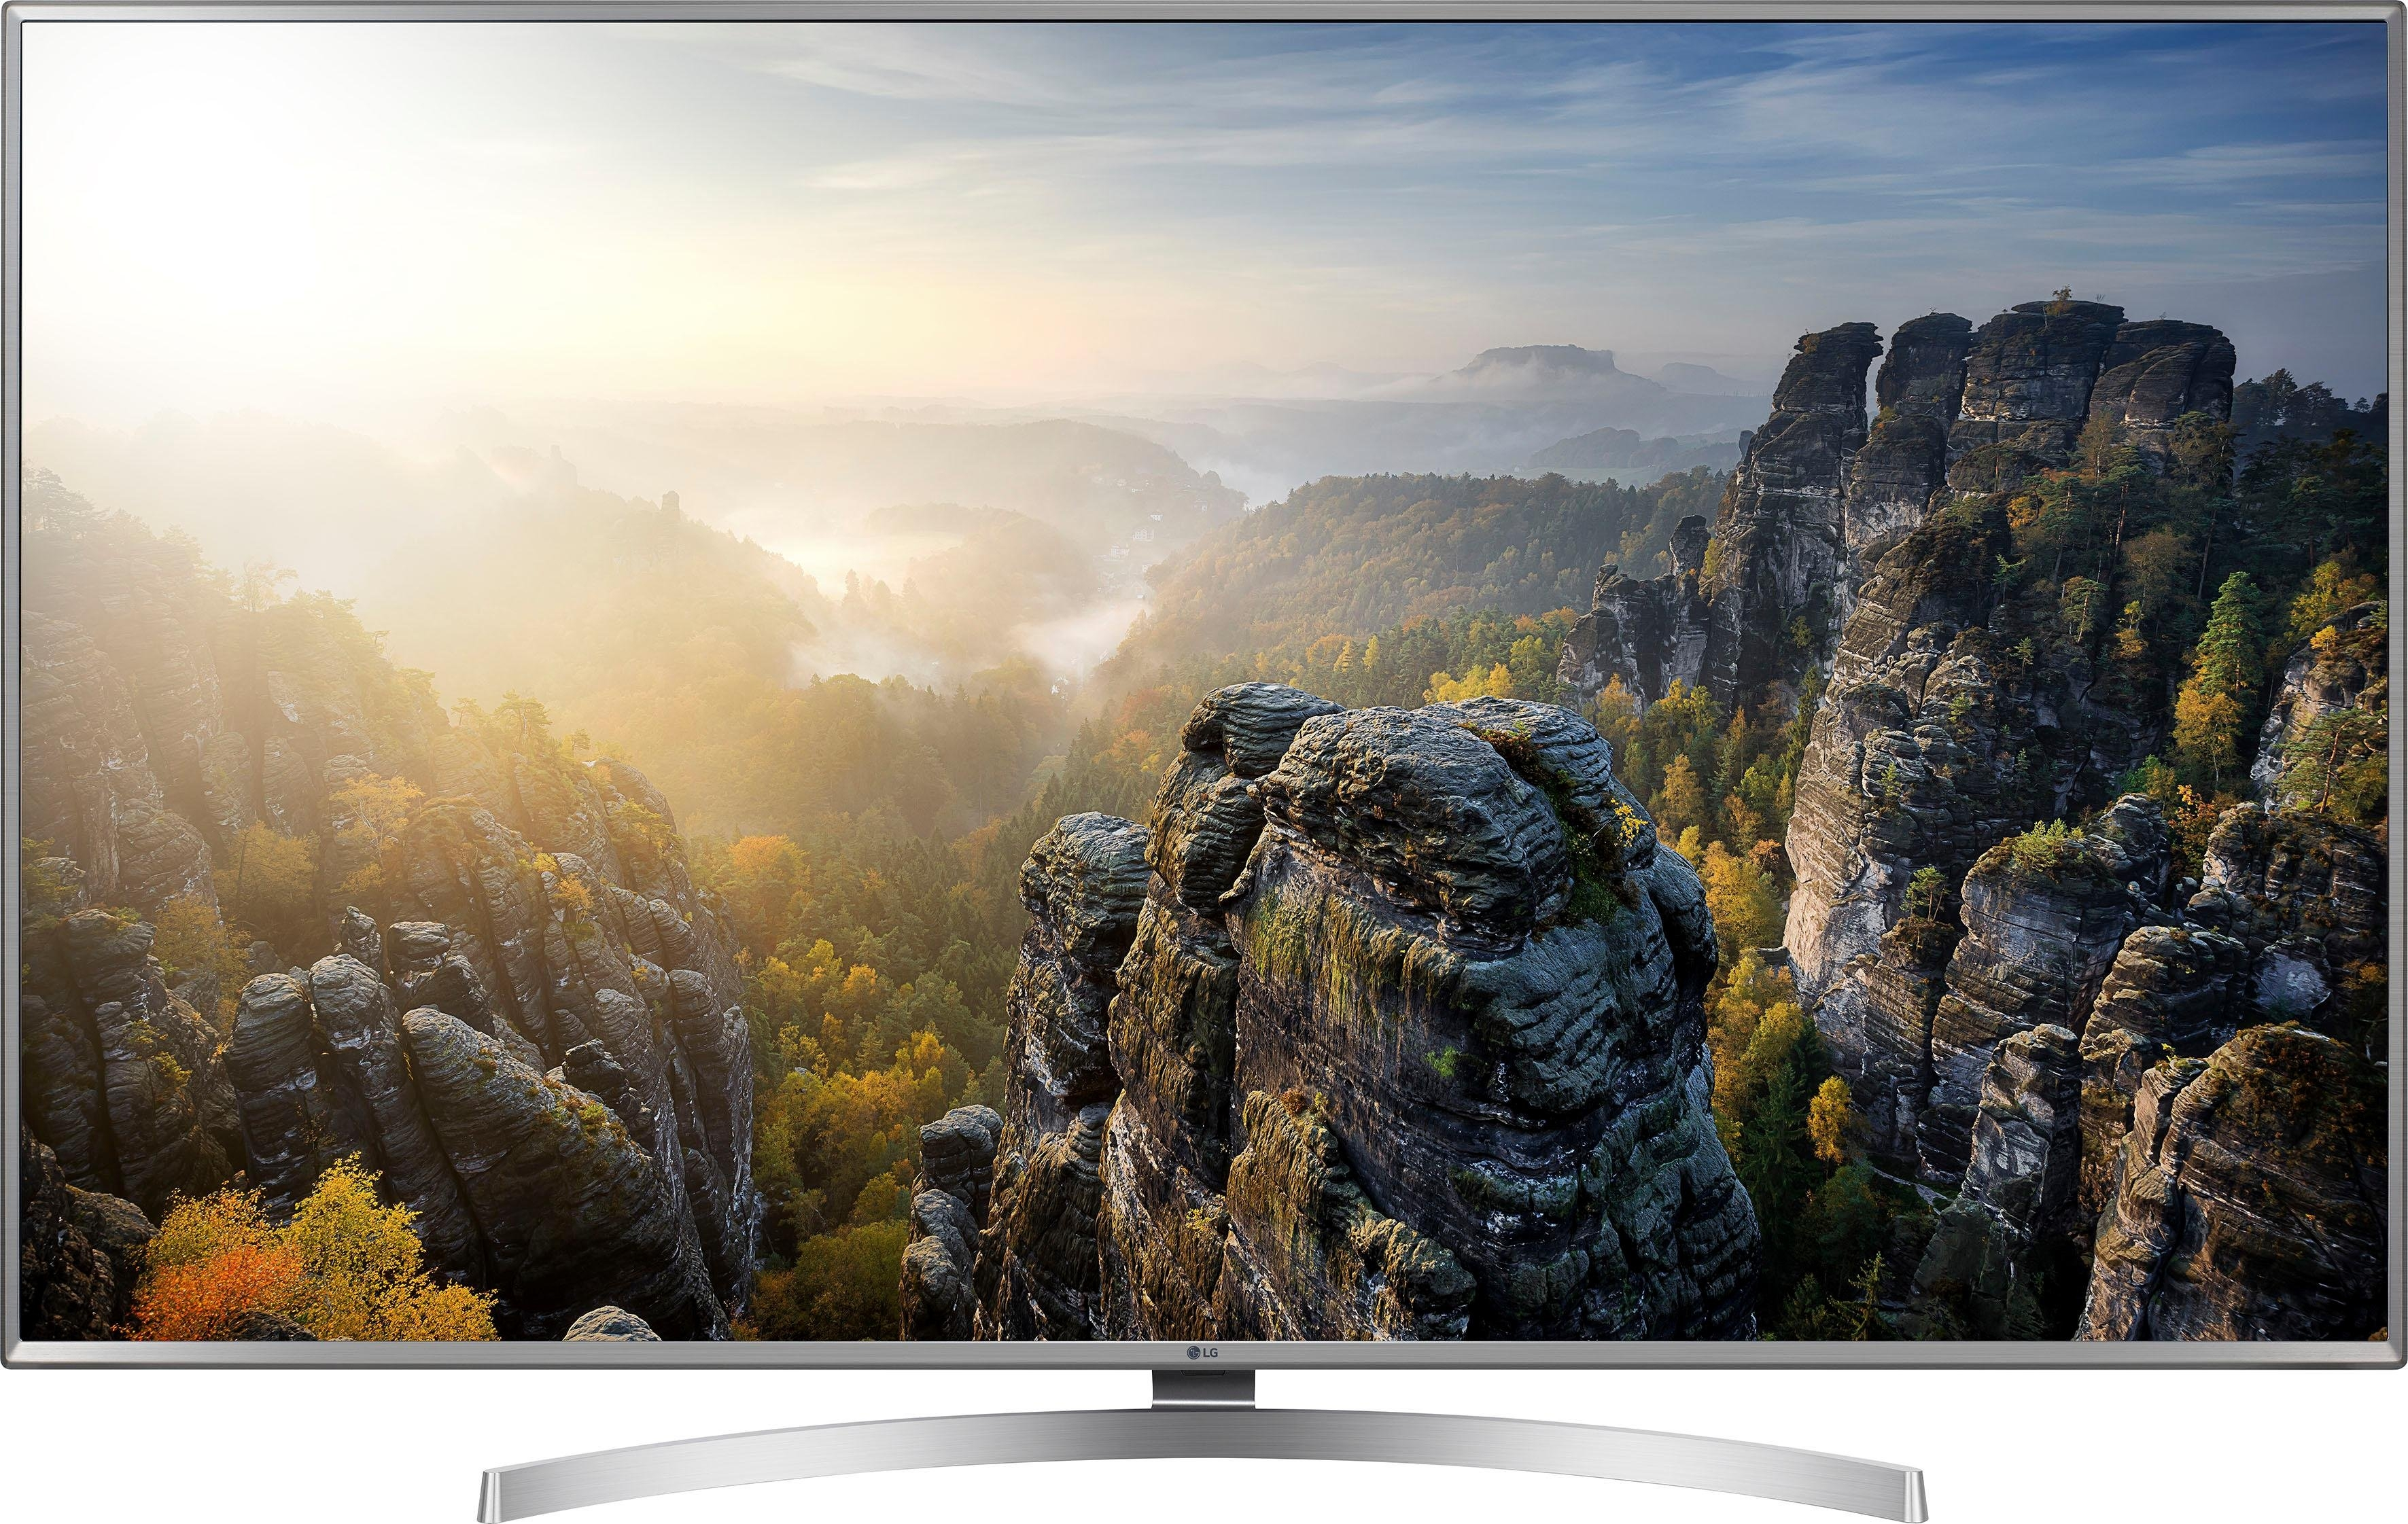 LG 70UK6950PLA led-tv (178 cm / (70 inch), 4K Ultra HD, smart-tv voordelig en veilig online kopen